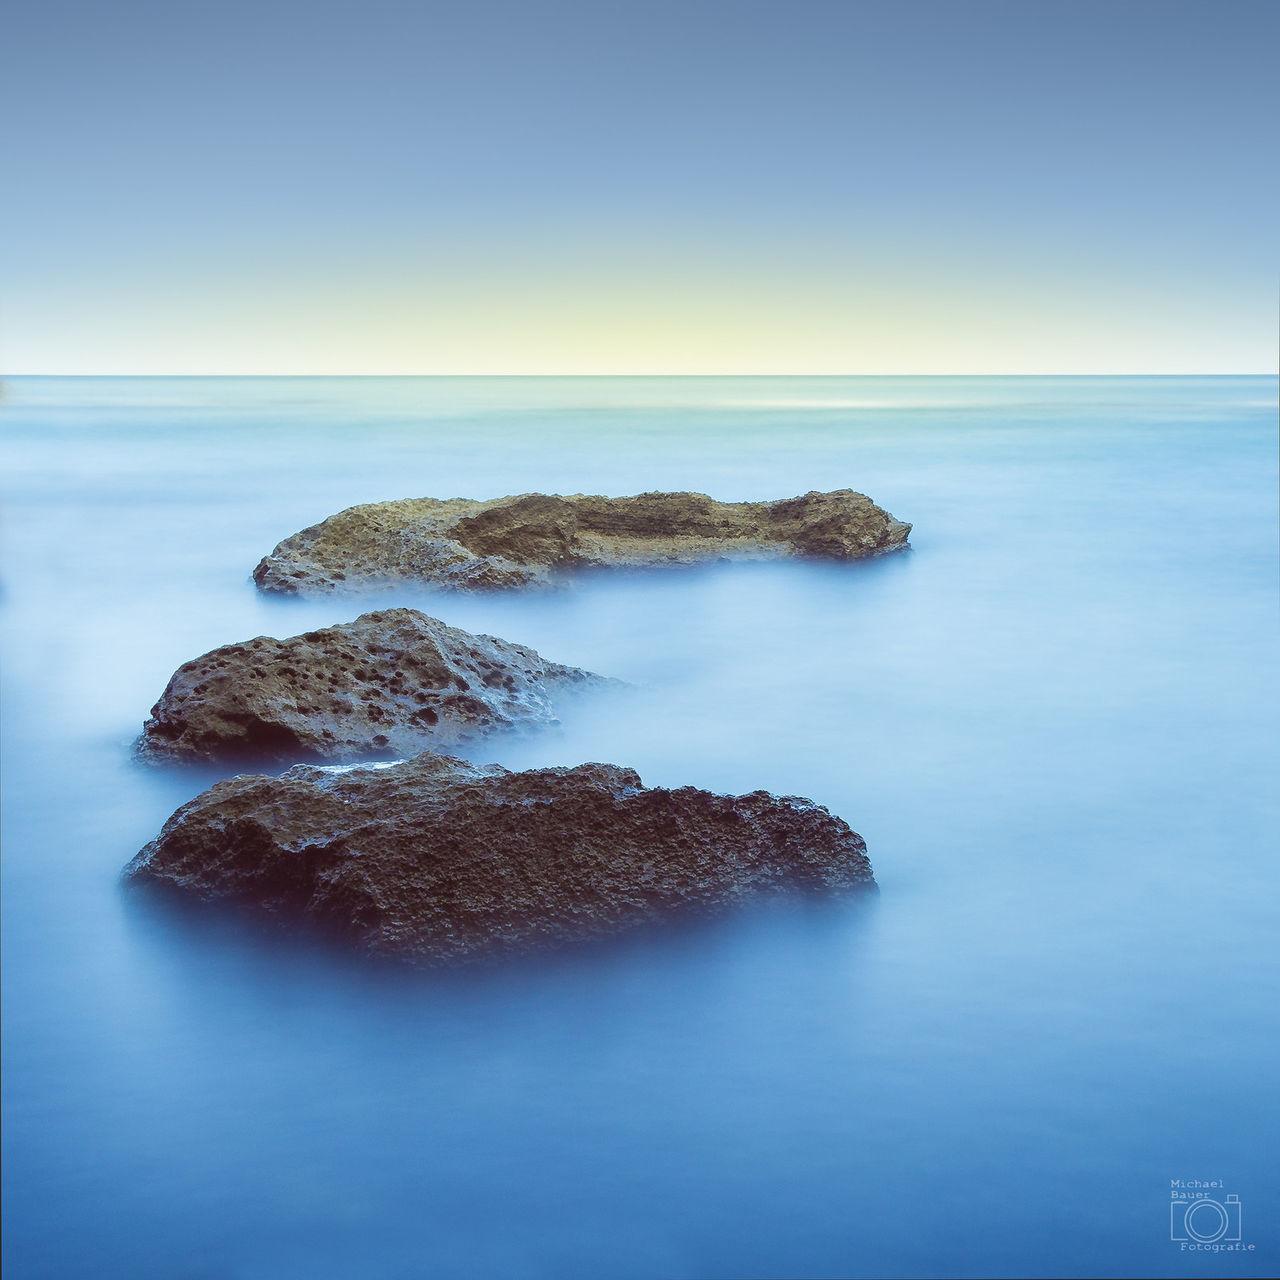 ROCK IN SEA AGAINST CLEAR BLUE SKY